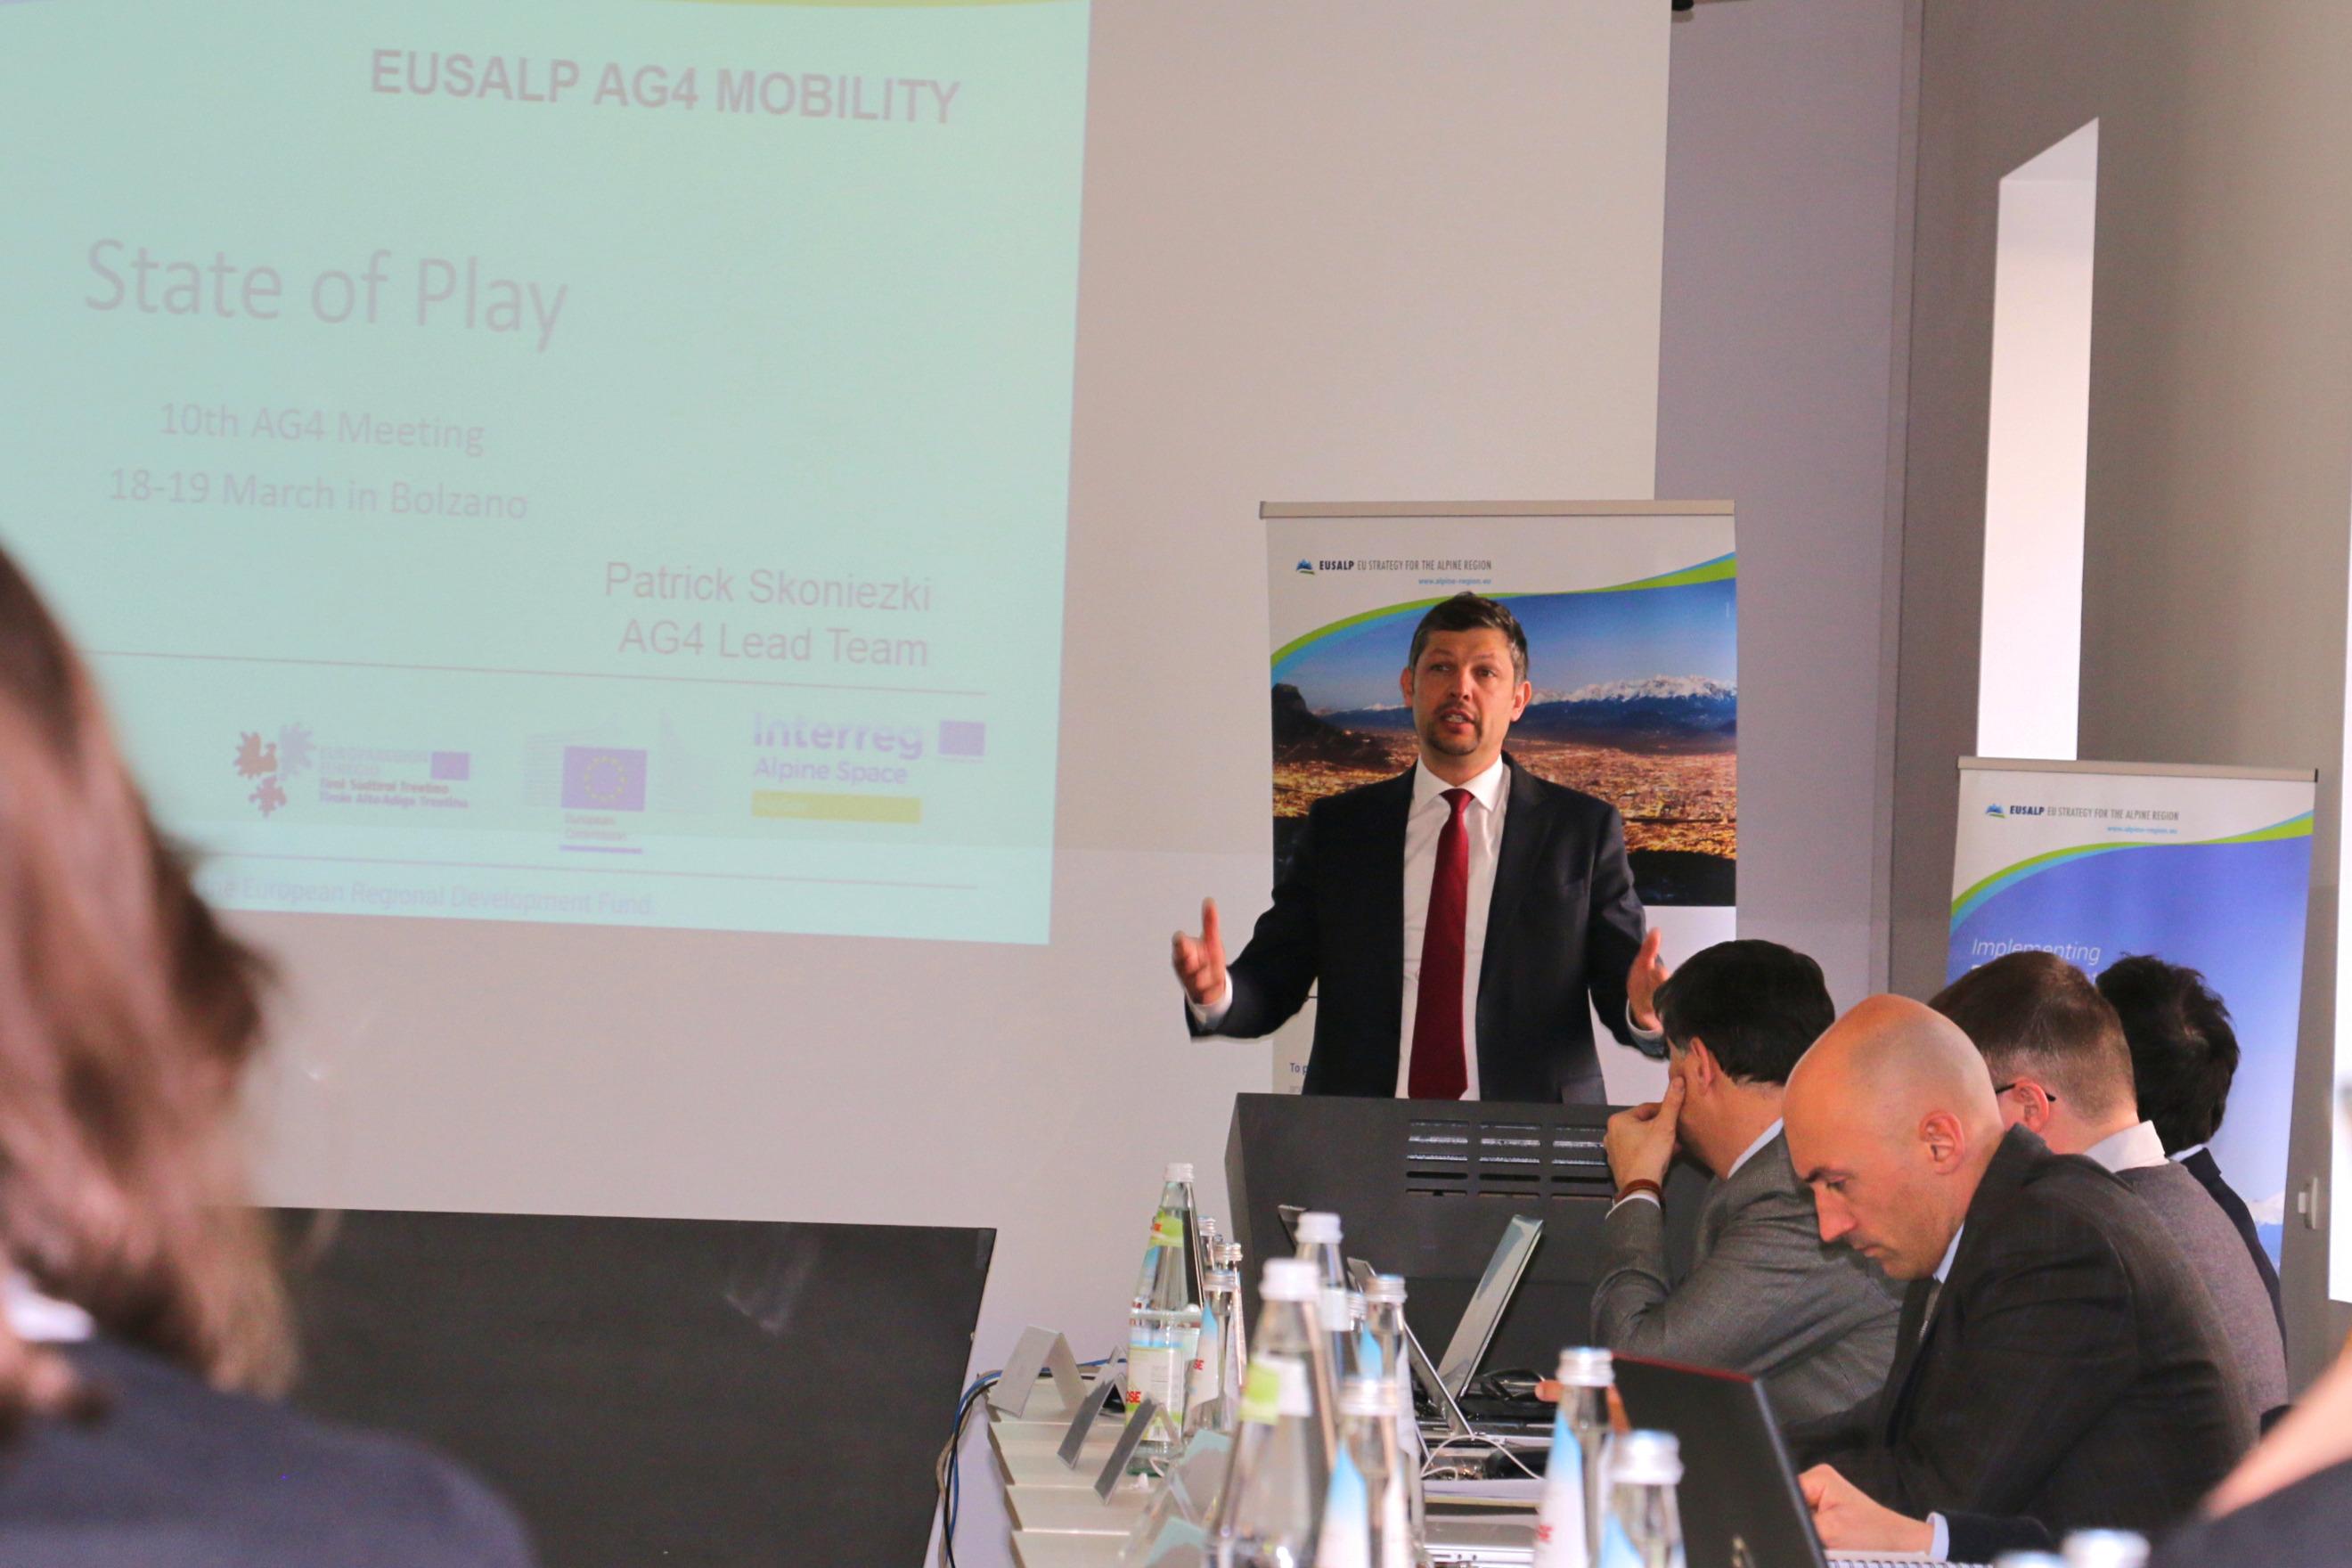 Daniel Alfreider opens 10th AG4 Meeting - 18/19 March 2019 in Bolzano; Credits: Land Südtirol